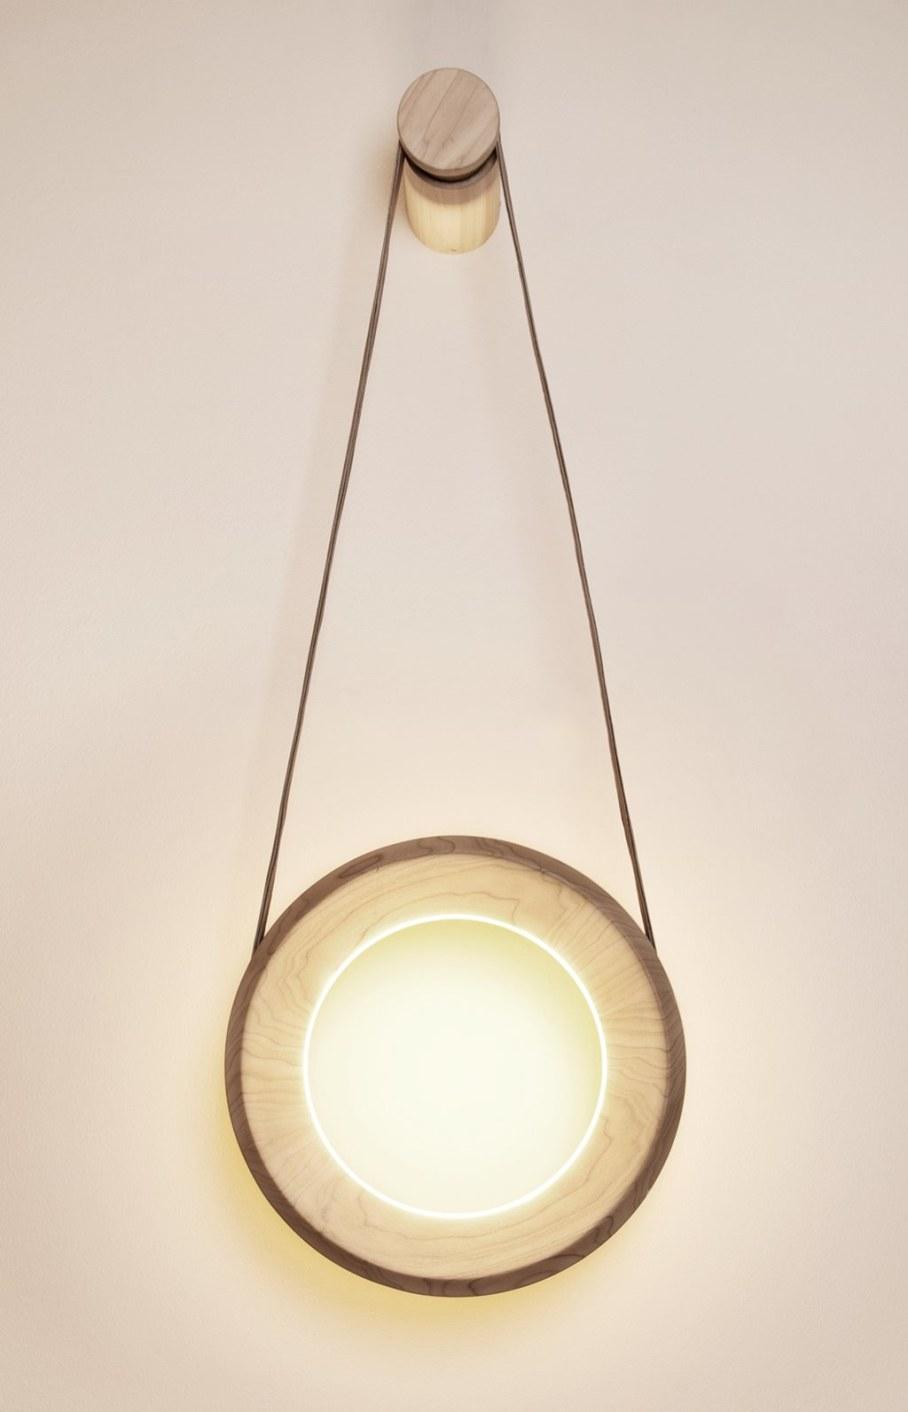 Halo Lamp - Interactive Light Fixture 1